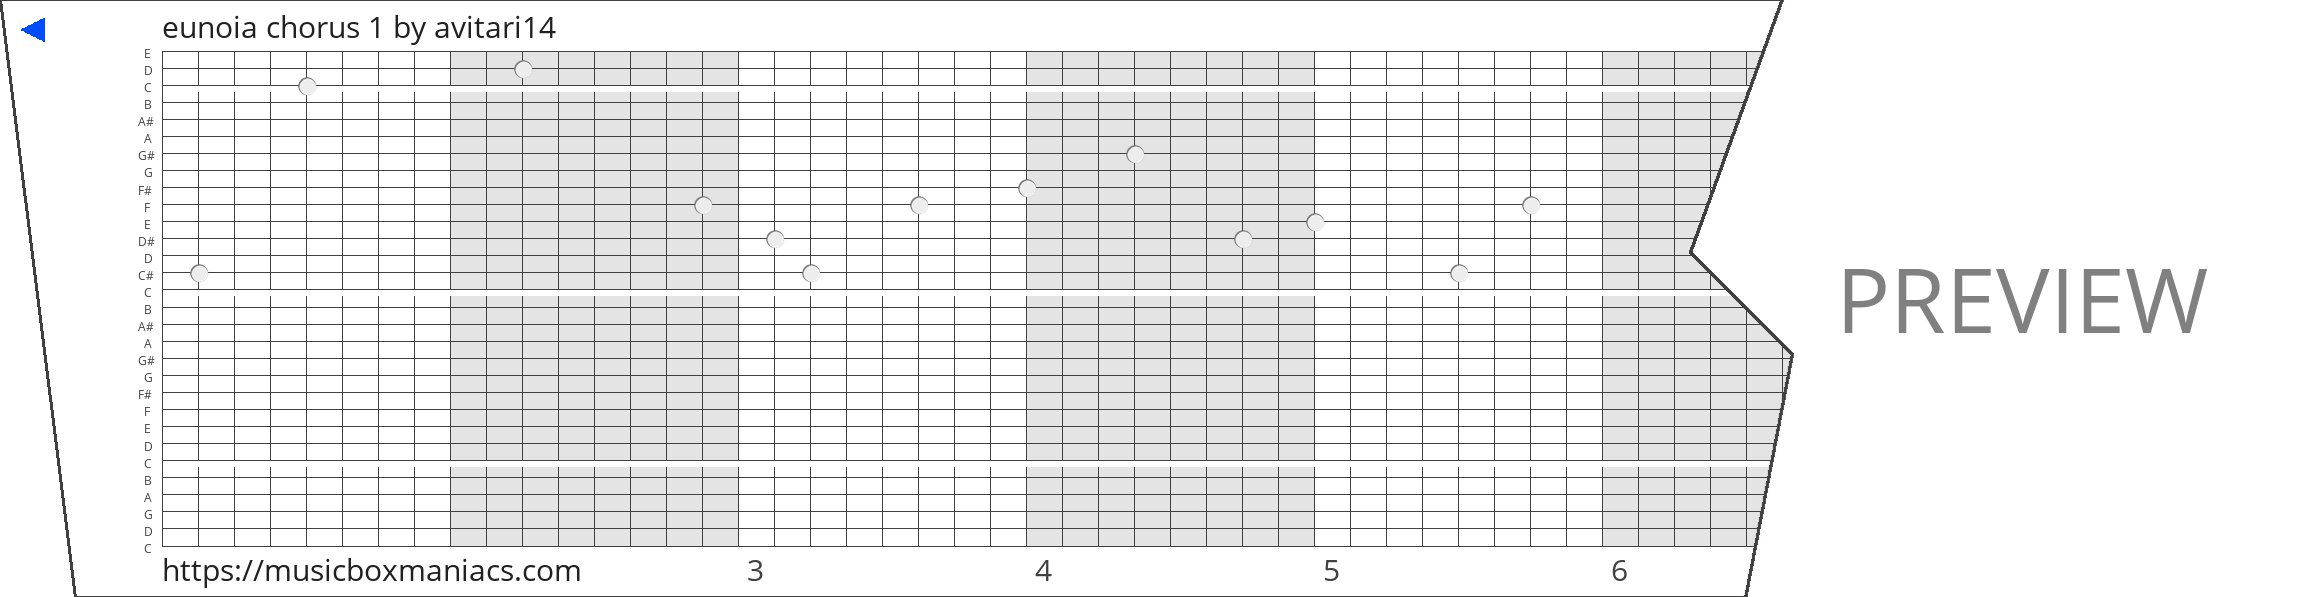 eunoia chorus 1 30 note music box paper strip